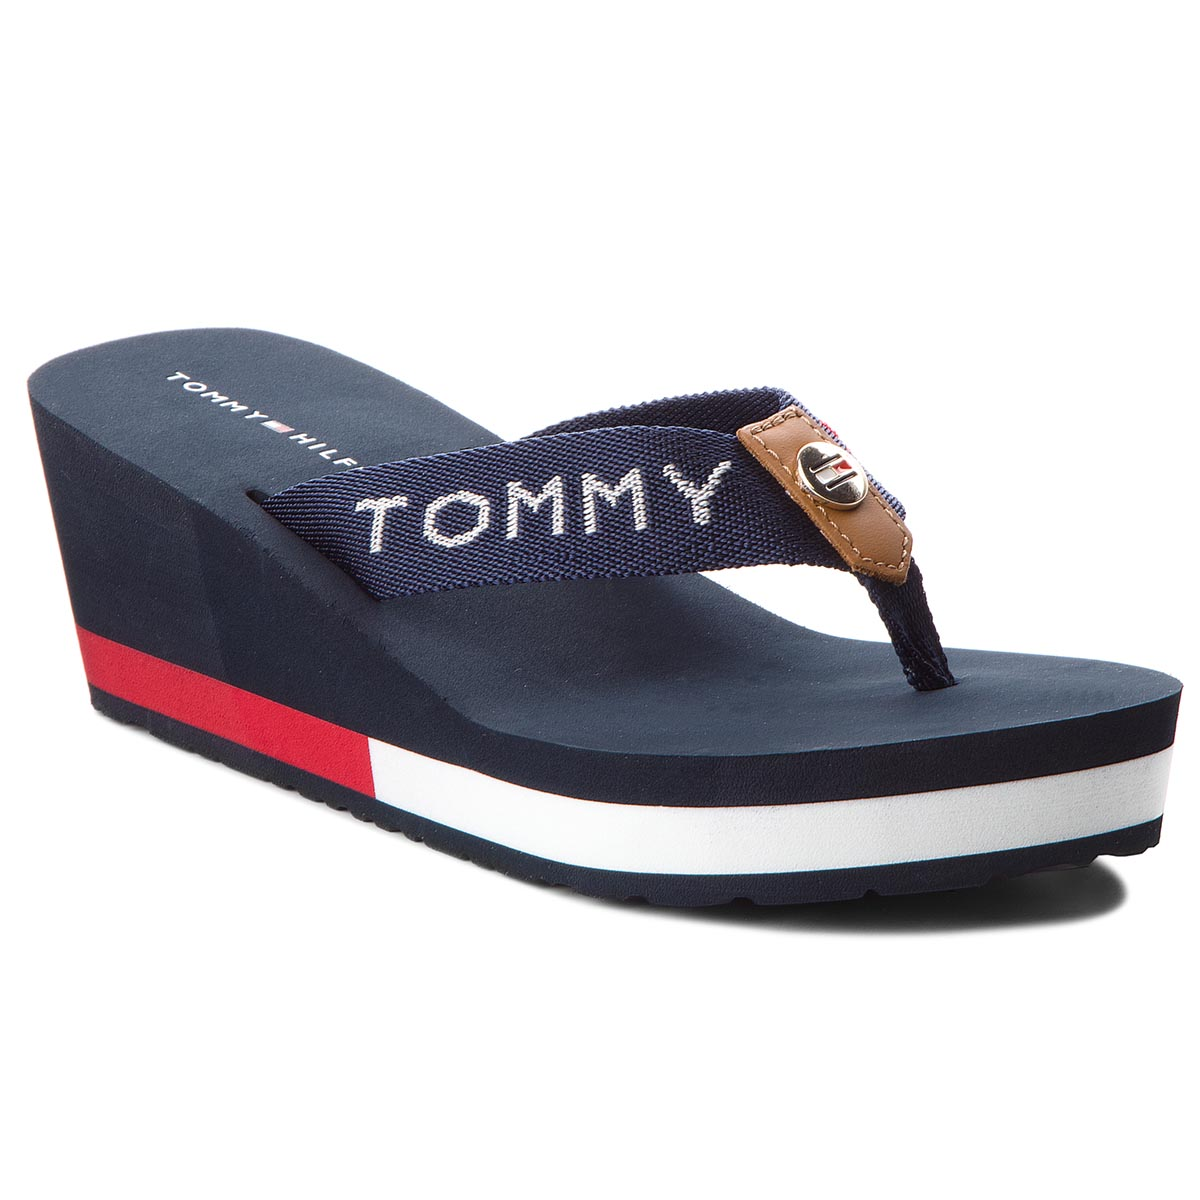 ... TOMMY HILFIGER - Corporate Beach Sandal FW0FW02958 Midnight 403. -16%.  Žabky ... ff99a84977